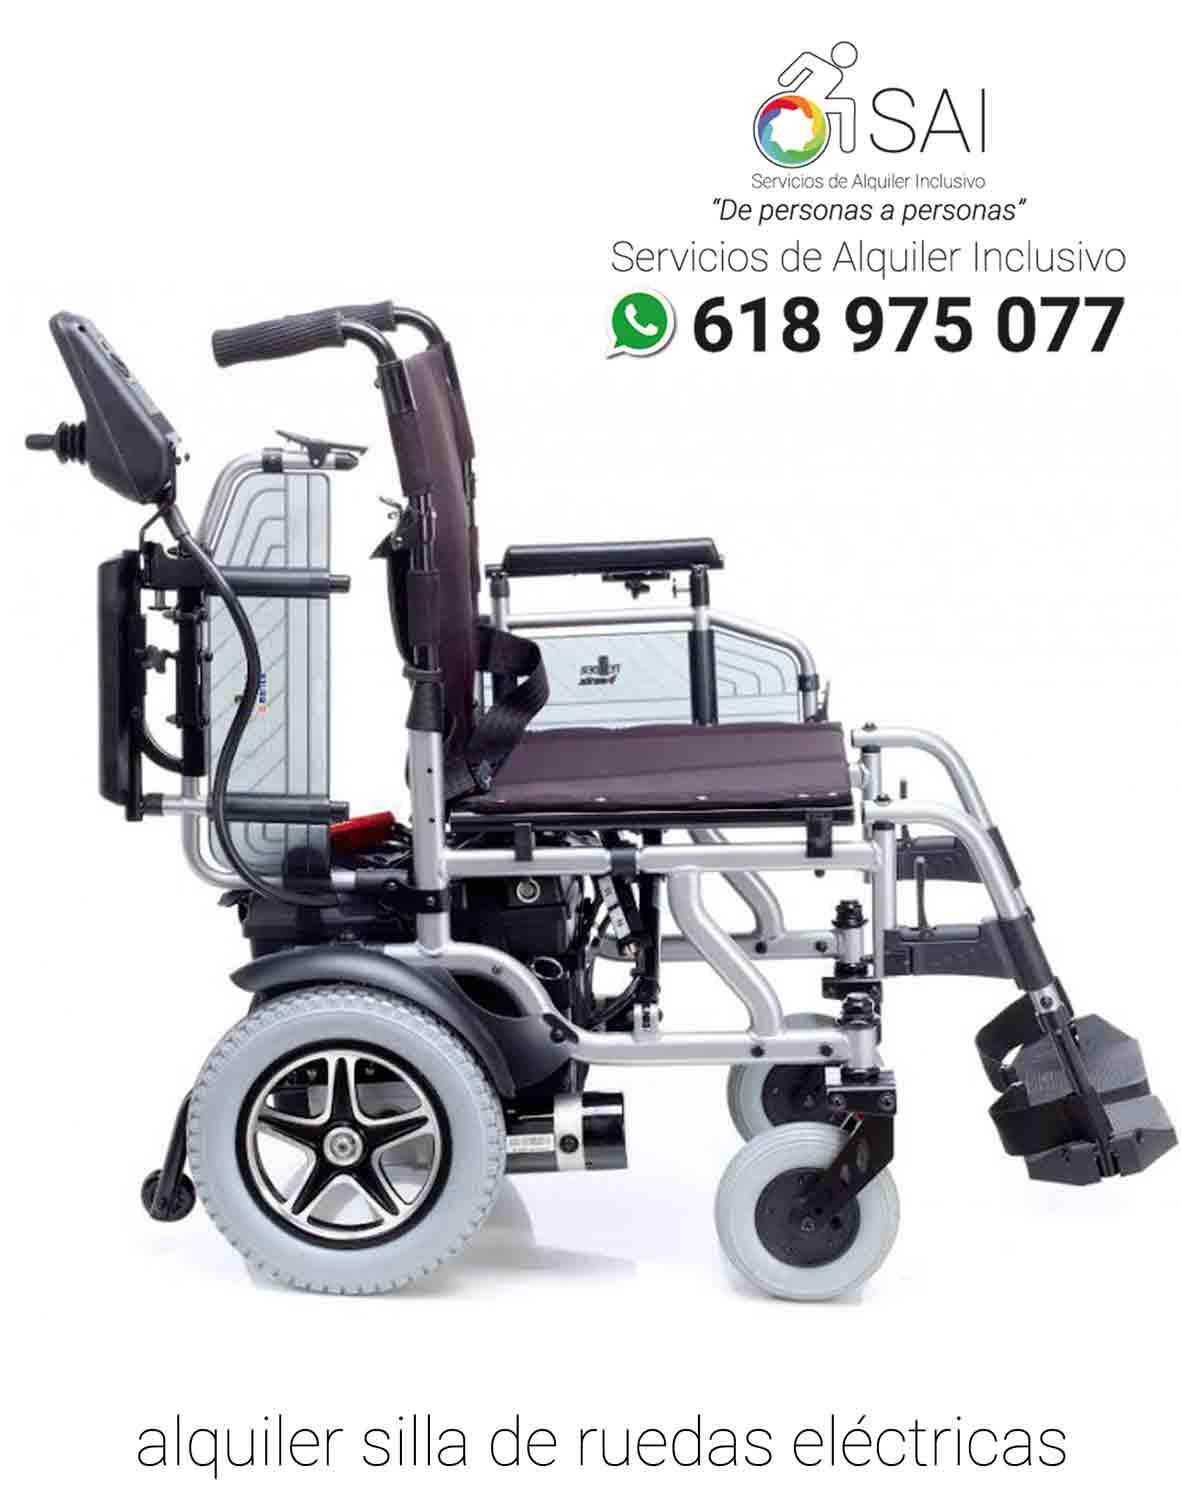 Servicios alquiler inclusivo barcelona alquiler silla de for Pisos de alquiler en silla